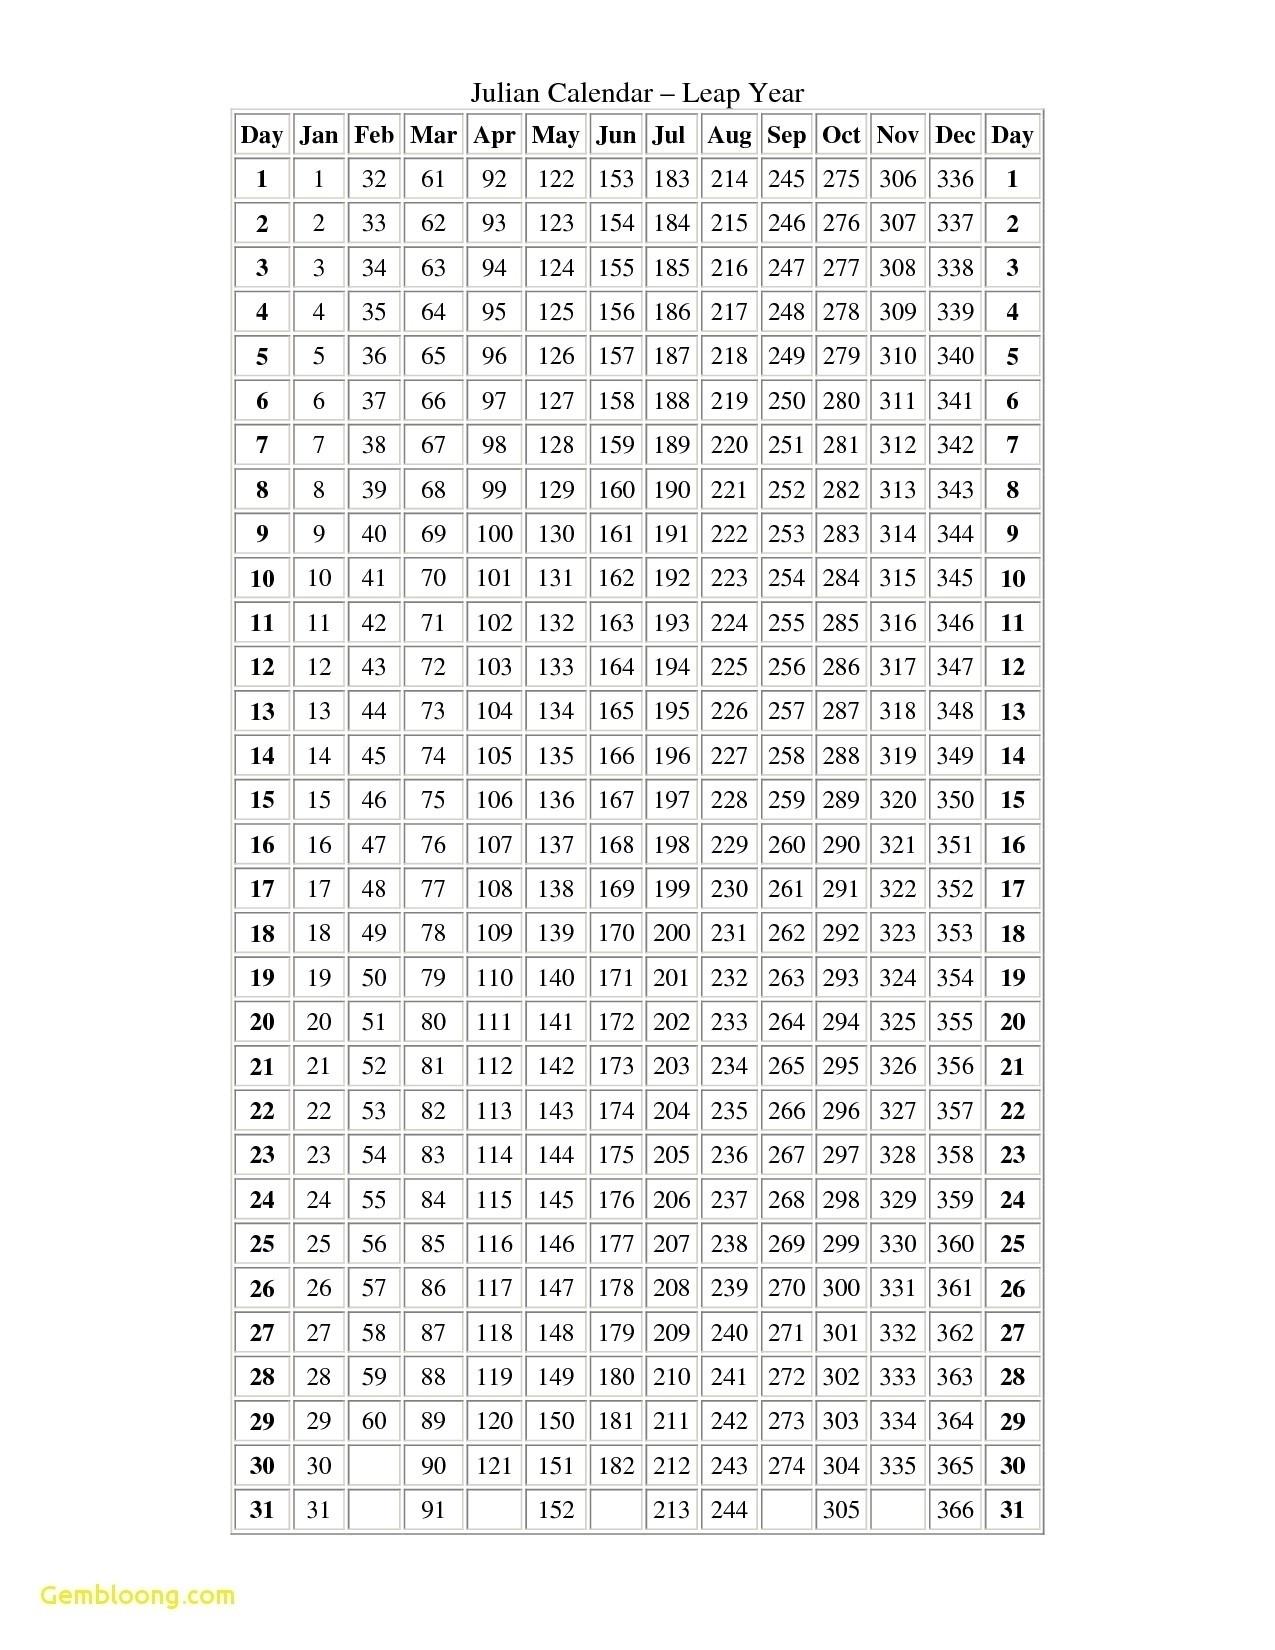 Calendar Year Julian Date | Ten Free Printable Calendar